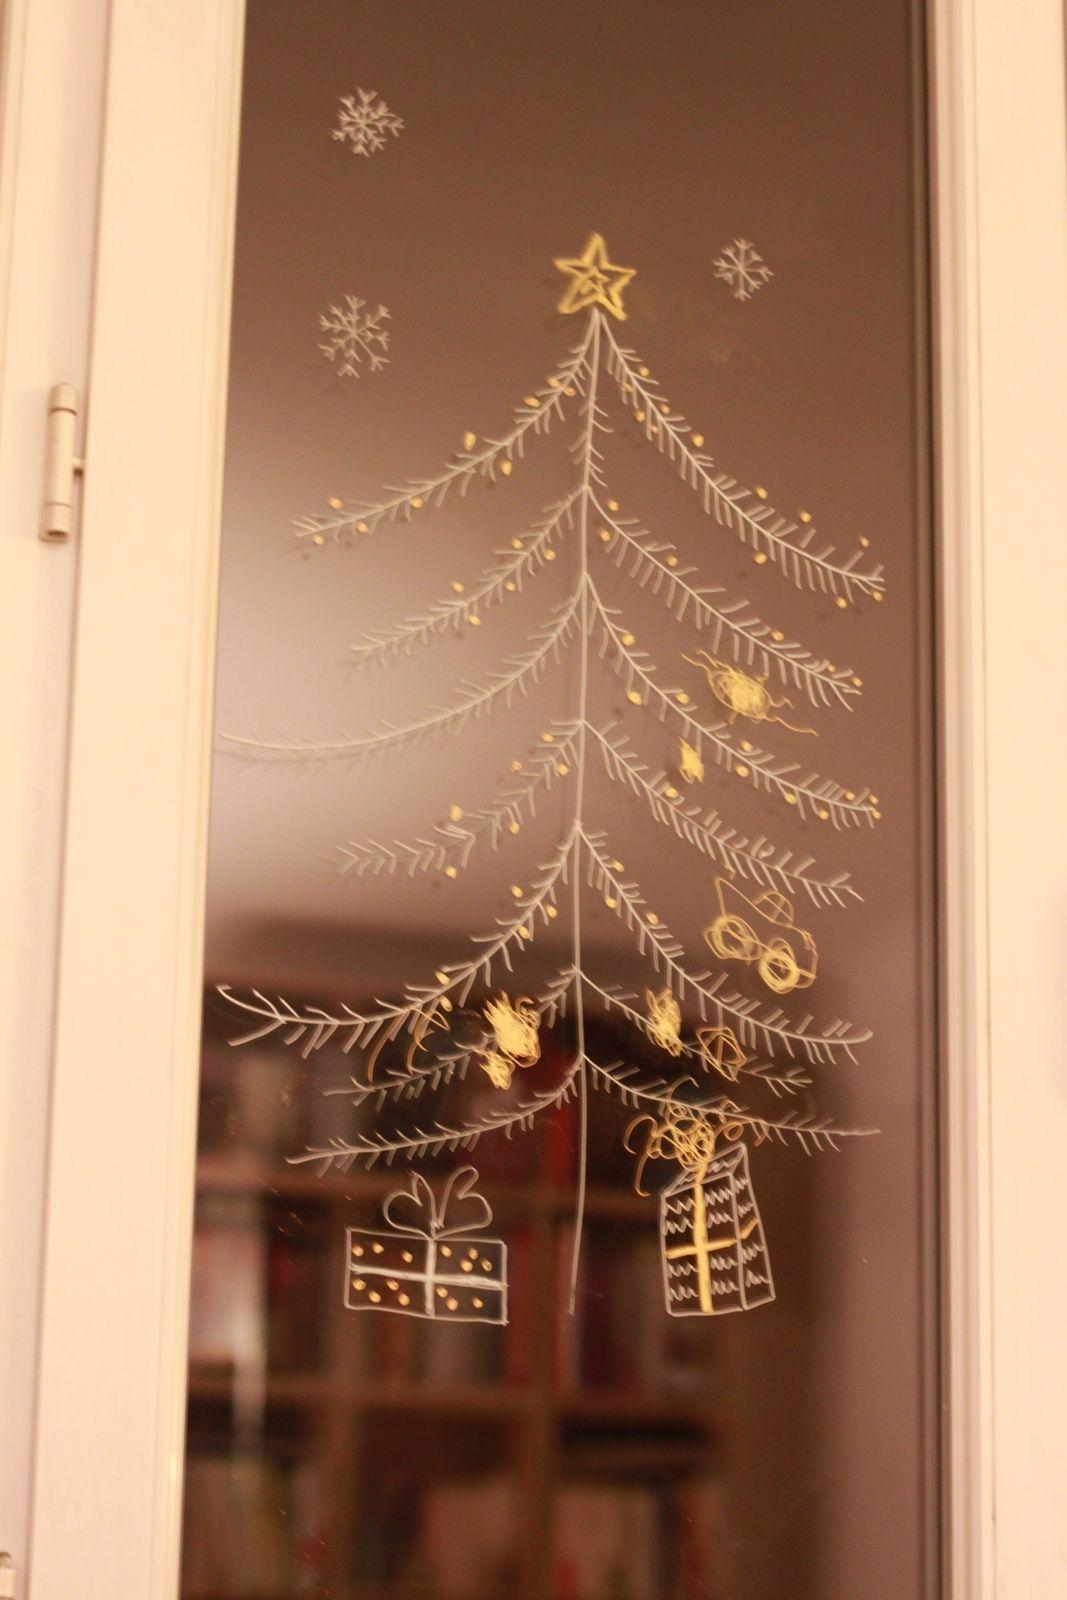 Dessins sur les fenêtres merci POSCA! Sapin Dessin, Dessin Fenetre, Deco  Fenetre Noel